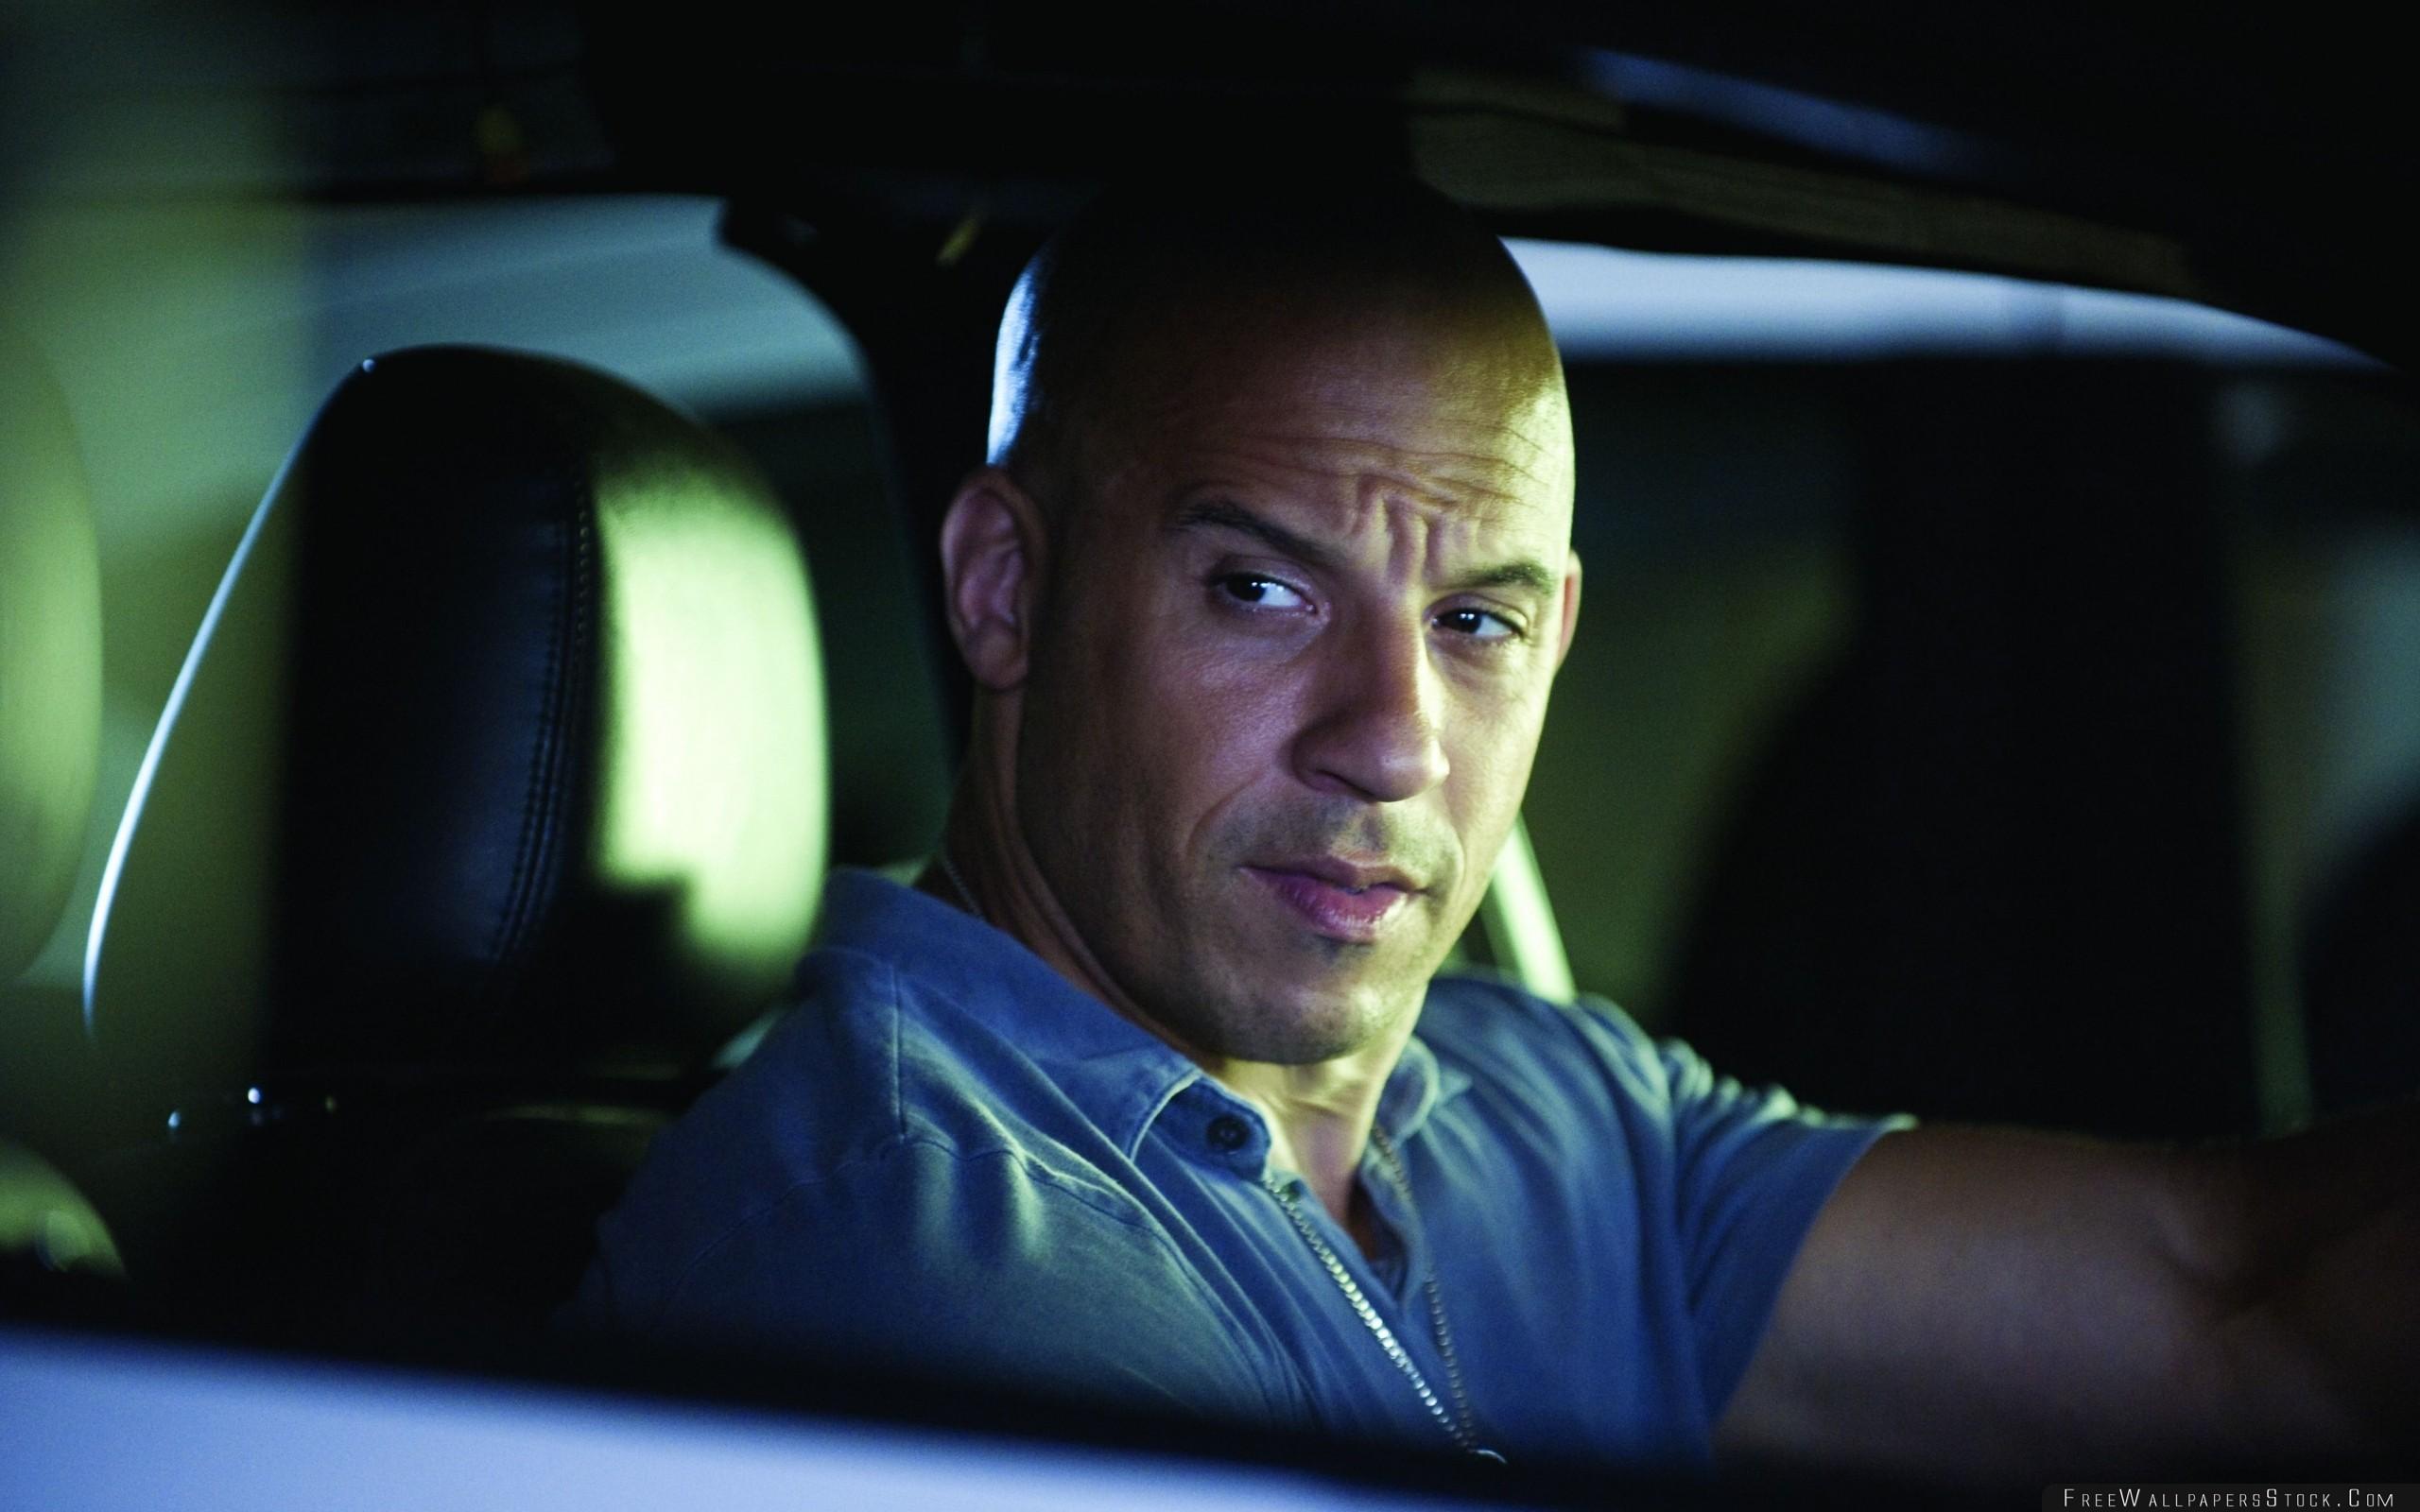 Download Free Wallpaper Vin Diesel Actor Man Car Wheel Serious Bald